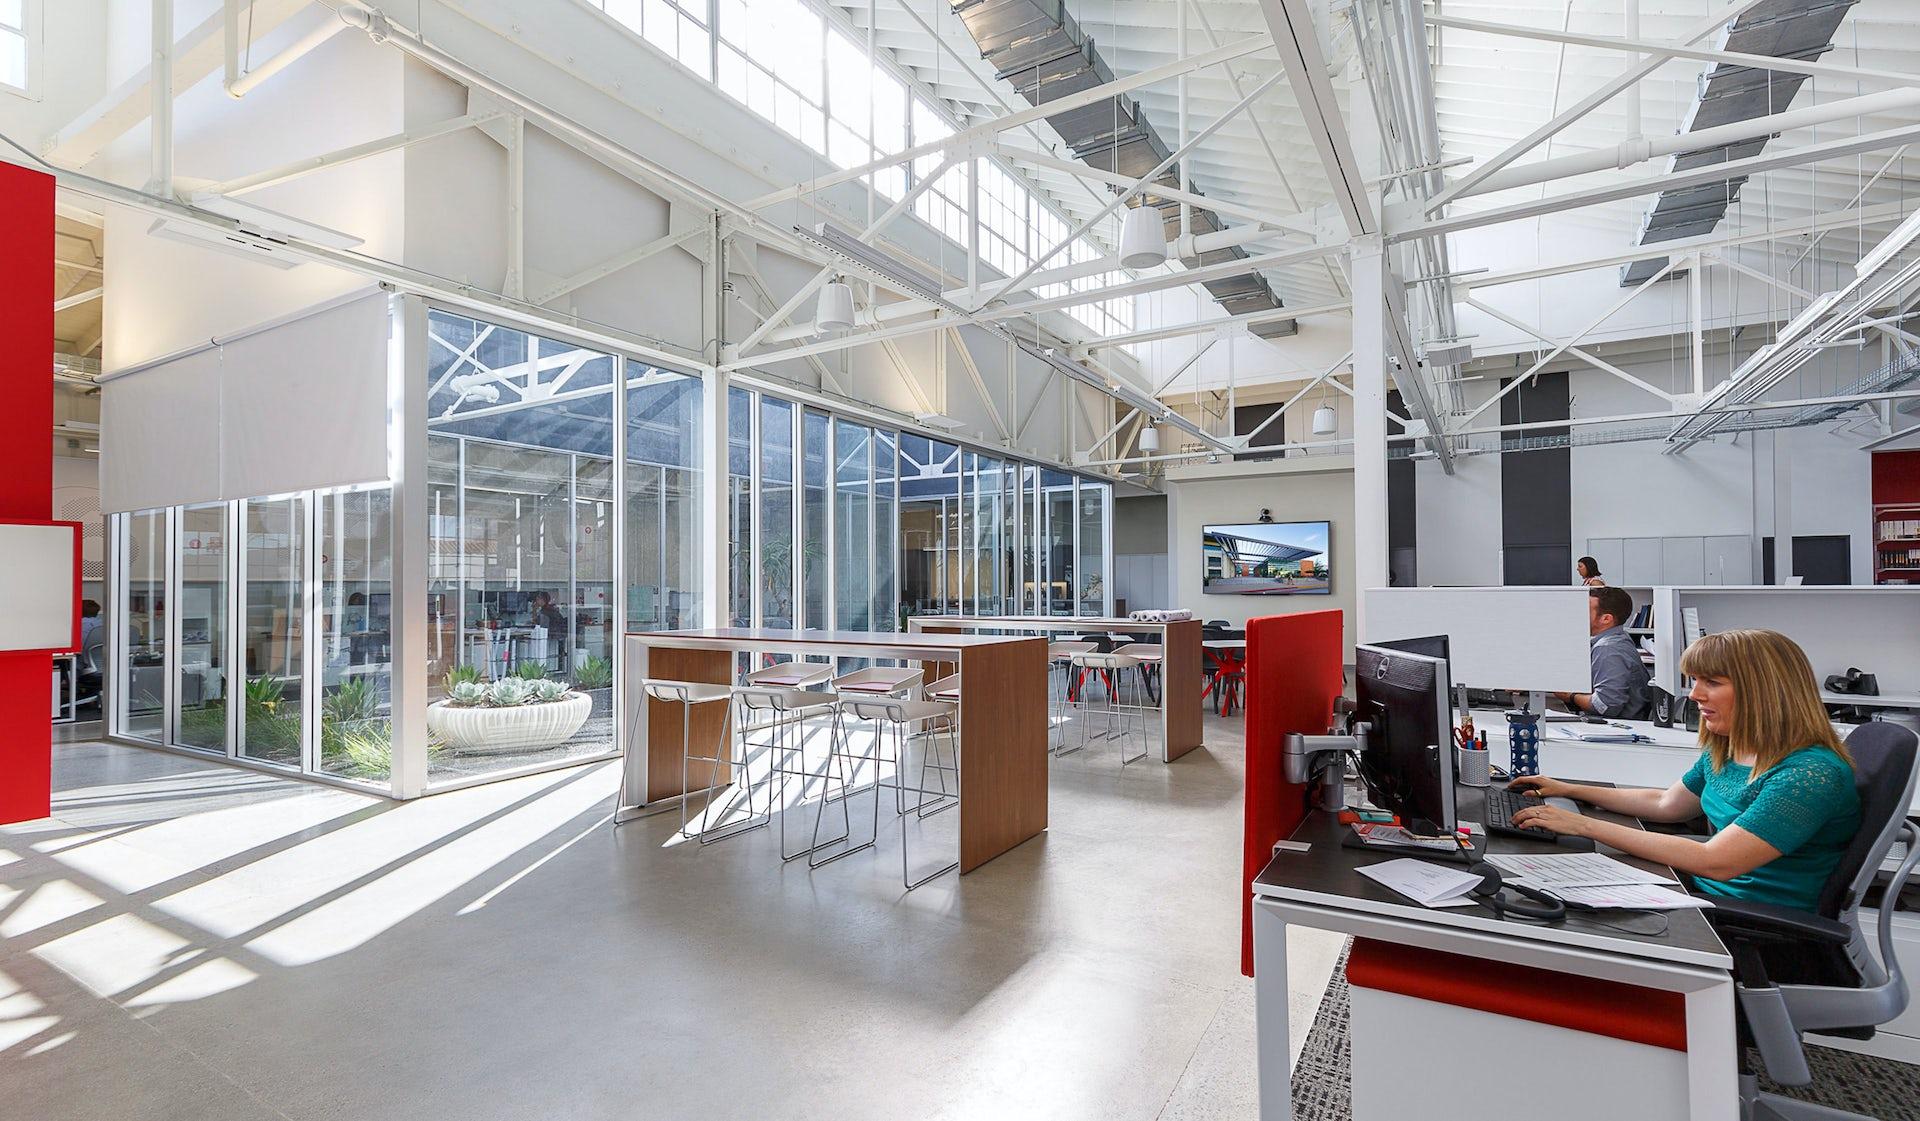 Peachy Lpa San Diego Lpa Inc Interior Design Ideas Tzicisoteloinfo